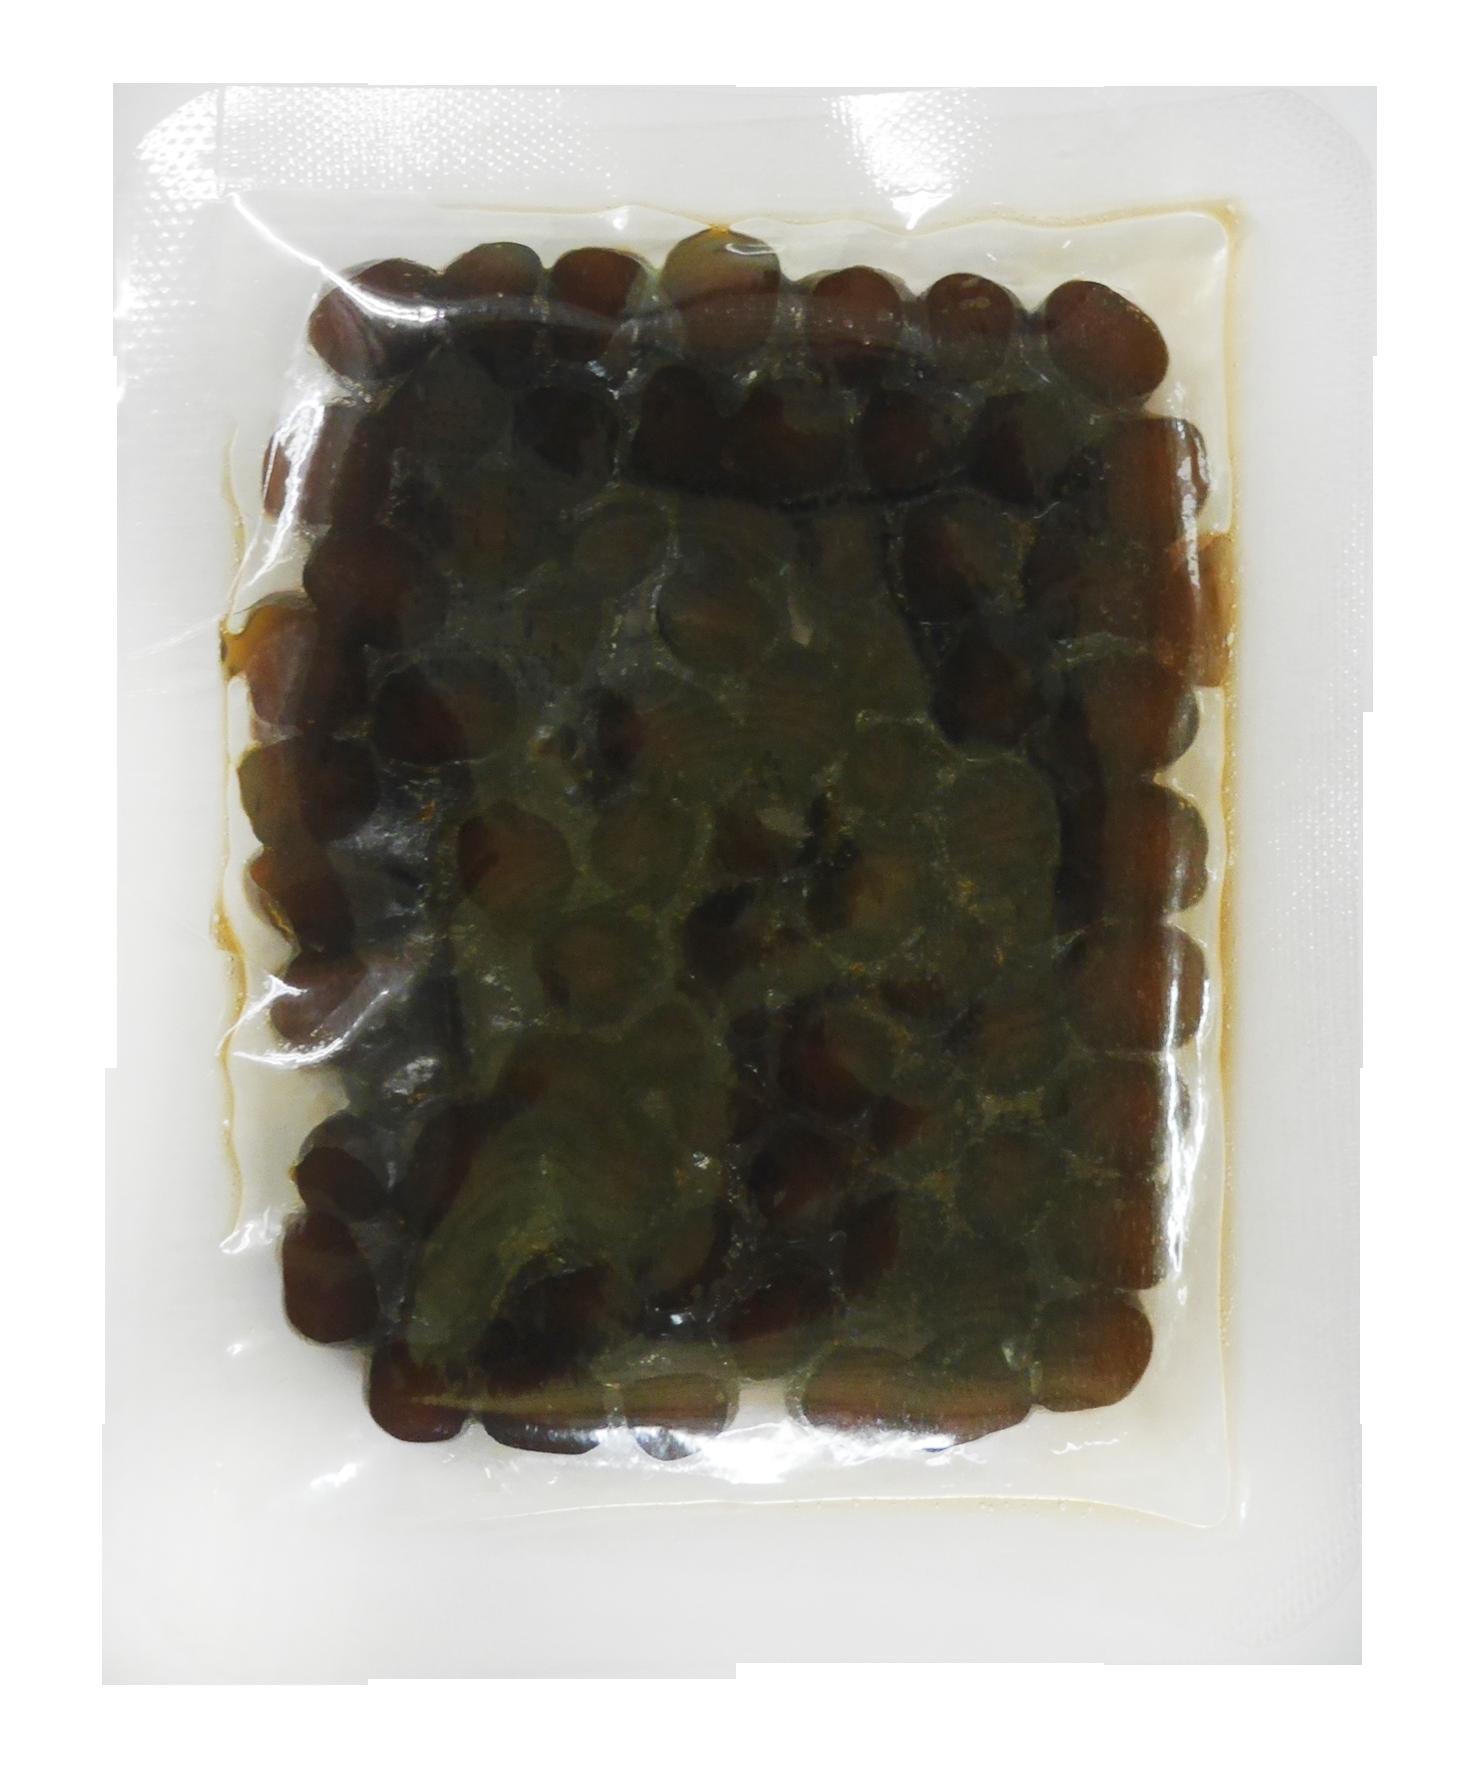 Taiwan Quality Instant Tapioca Ball Pearl For Milk tea Bubble Tea Private Label 50g